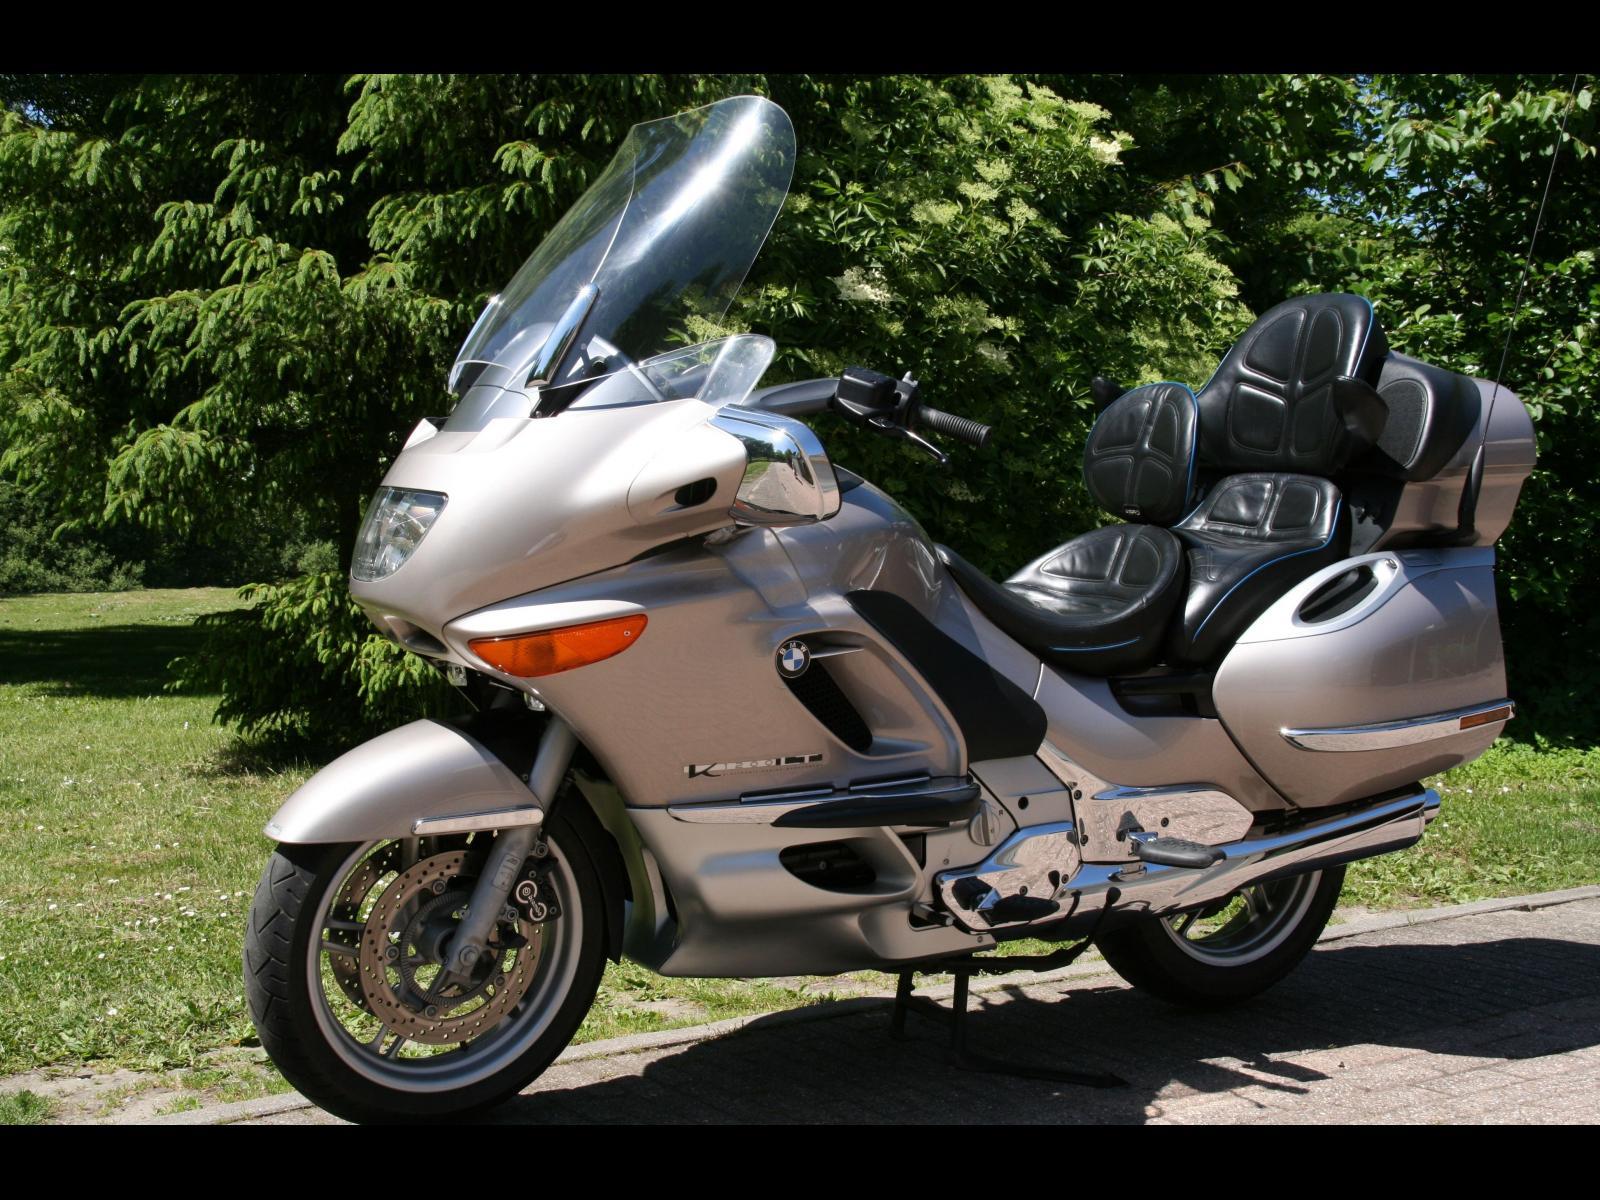 2000 BMW K1200LT #4 | Bikes.BestCarMag.com